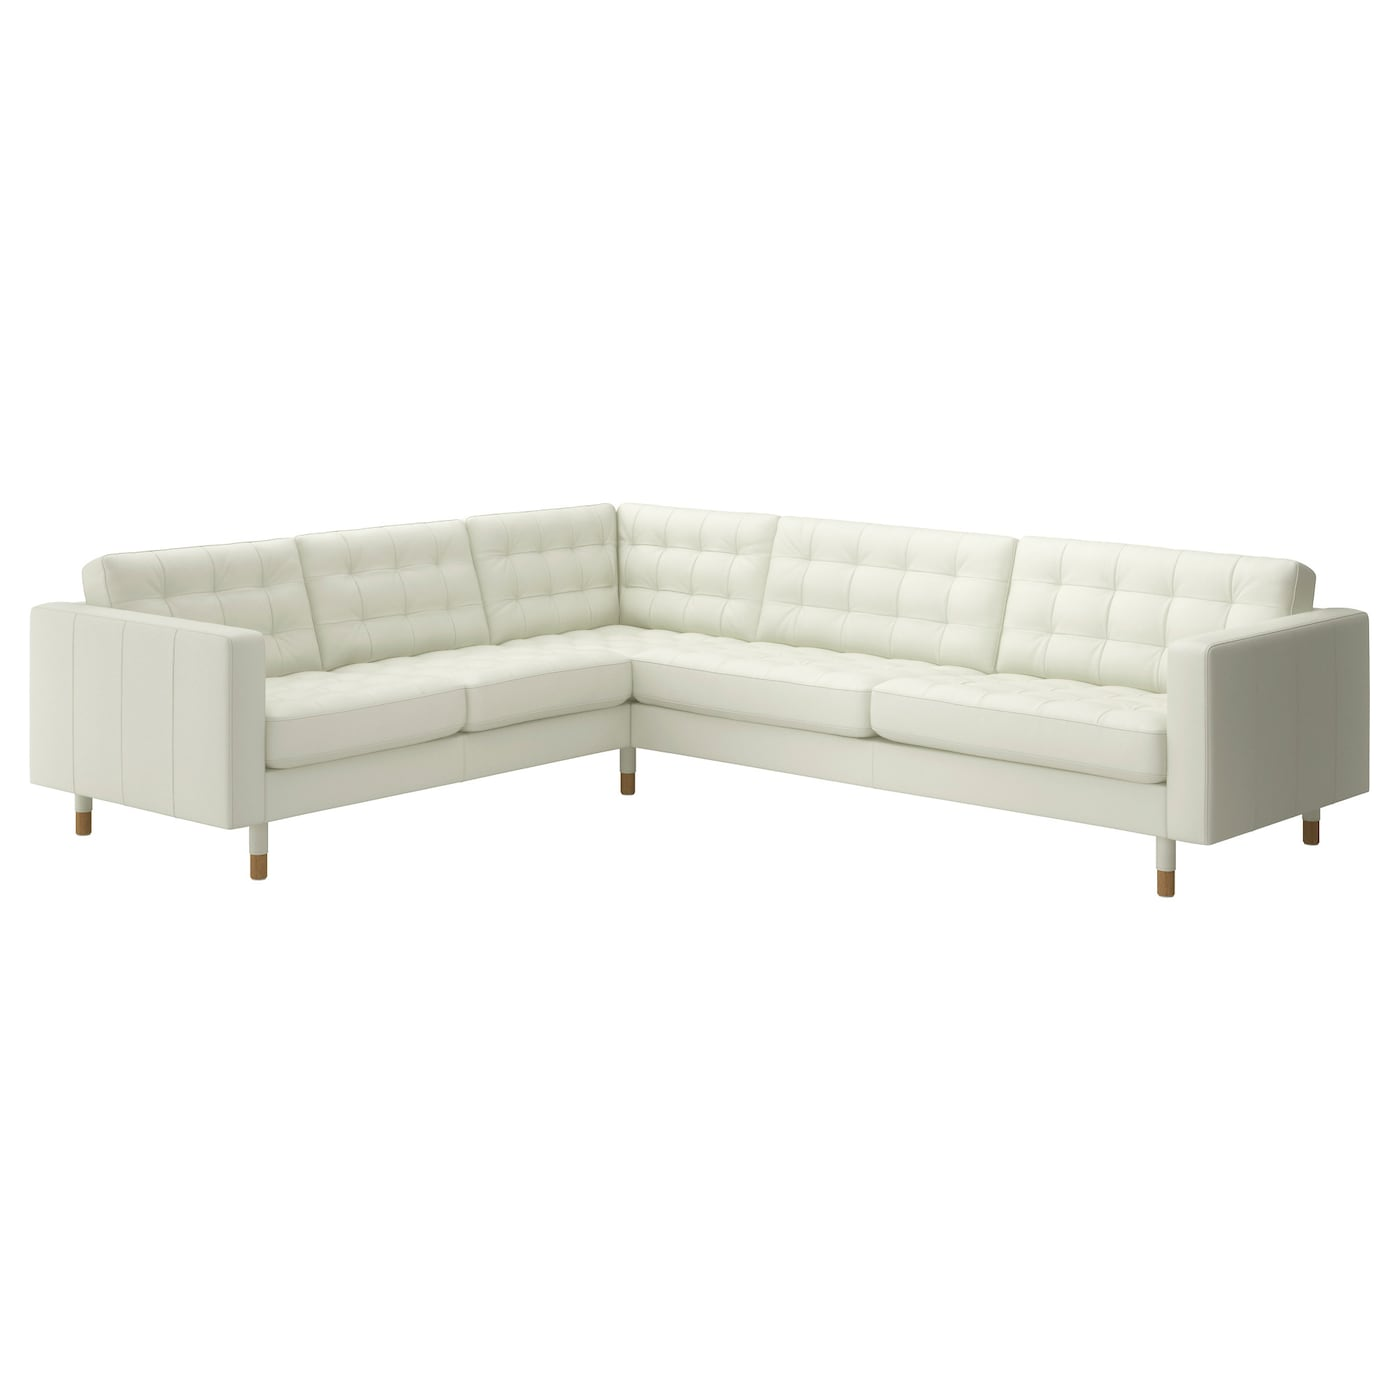 landskrona canap d 39 angle 5 places grann bomstad blanc bois ikea. Black Bedroom Furniture Sets. Home Design Ideas